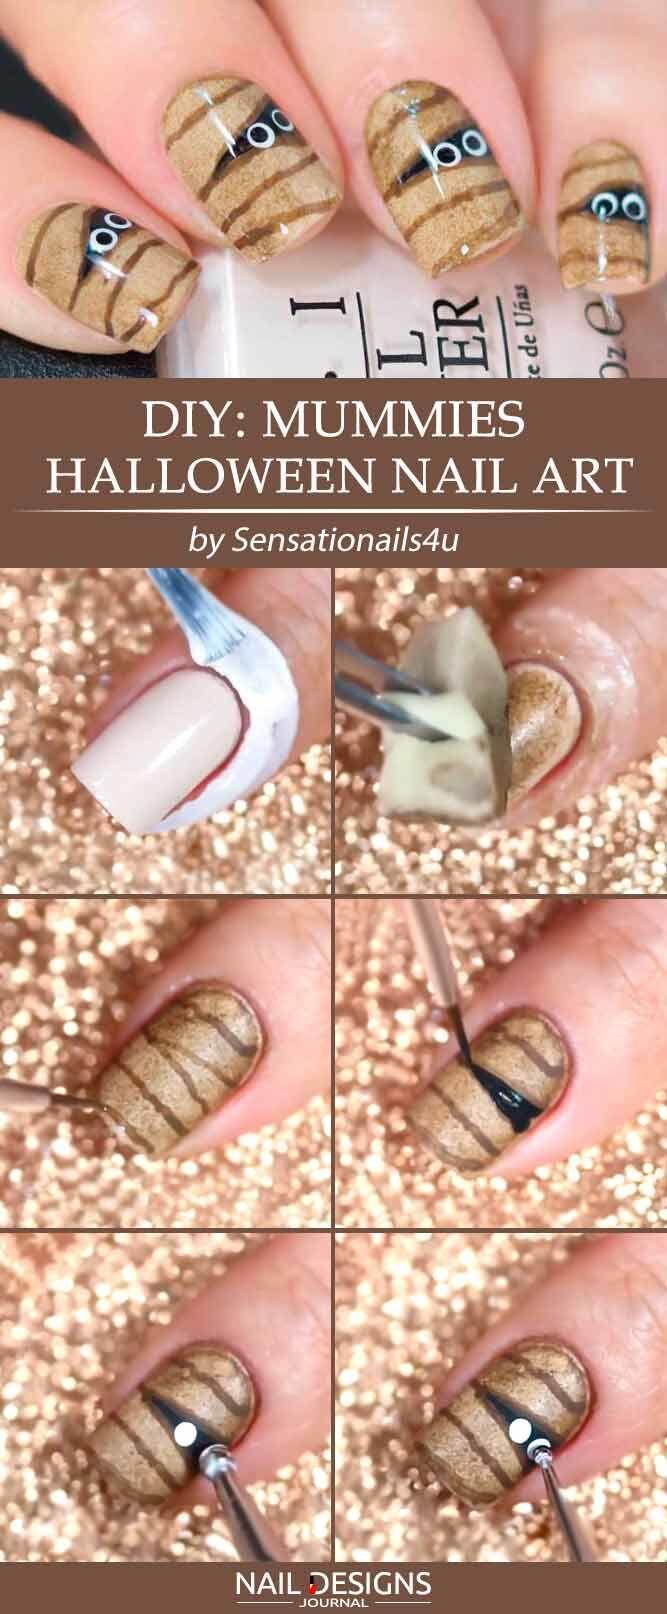 8 Nail Art Tema Halloween Paling Gampang, Pasti Jadi Pusat Perhatian